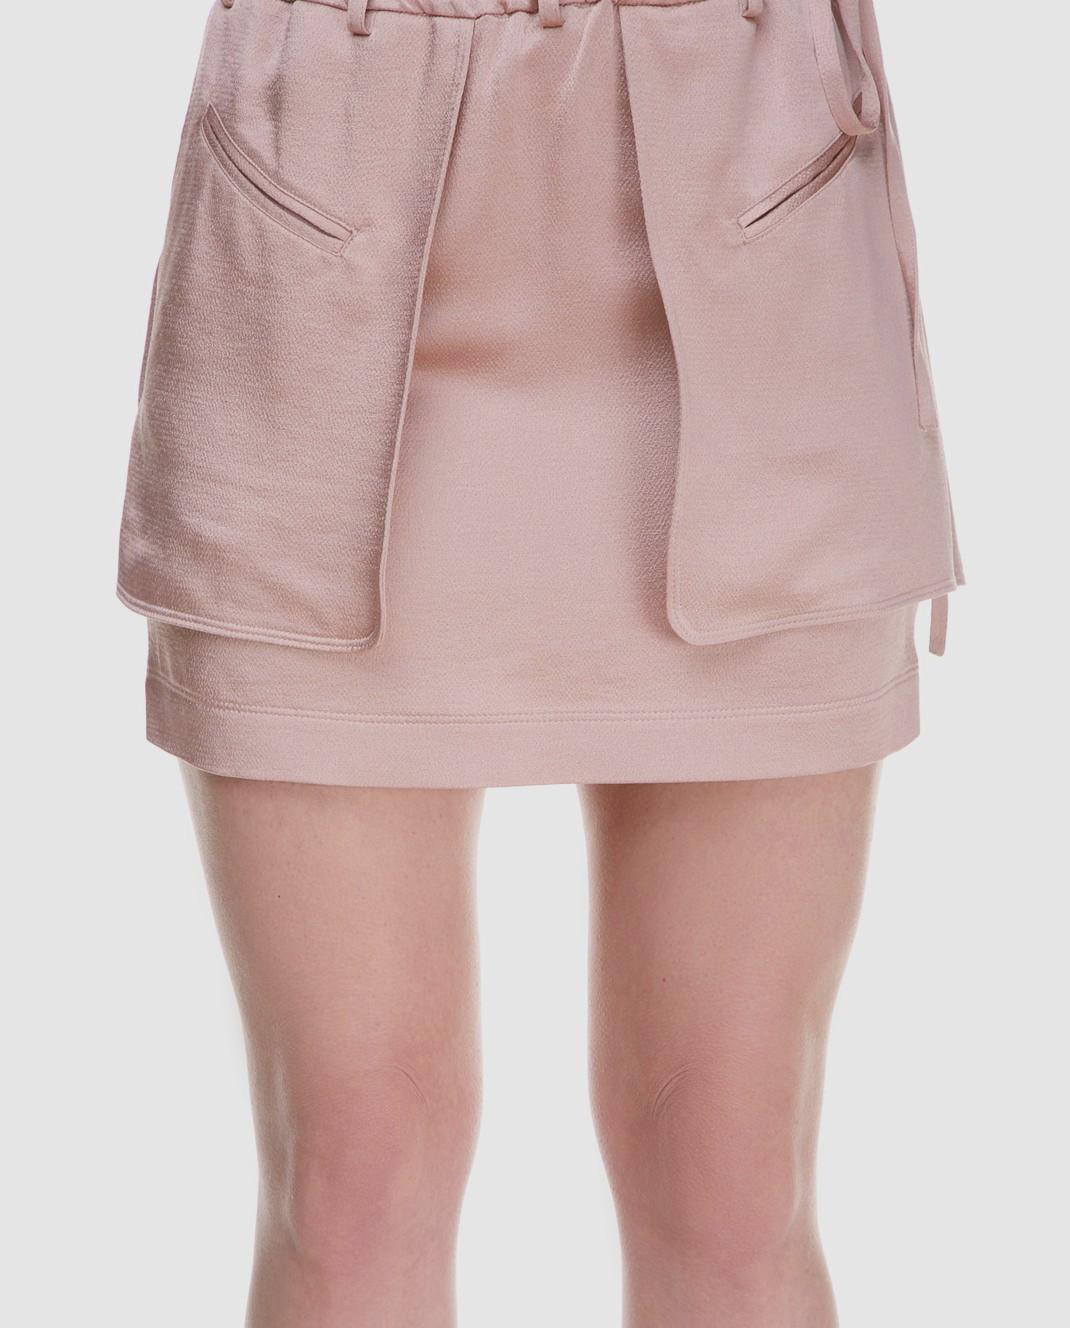 Valentino Розовая юбка PB0RA3K53H3 изображение 4